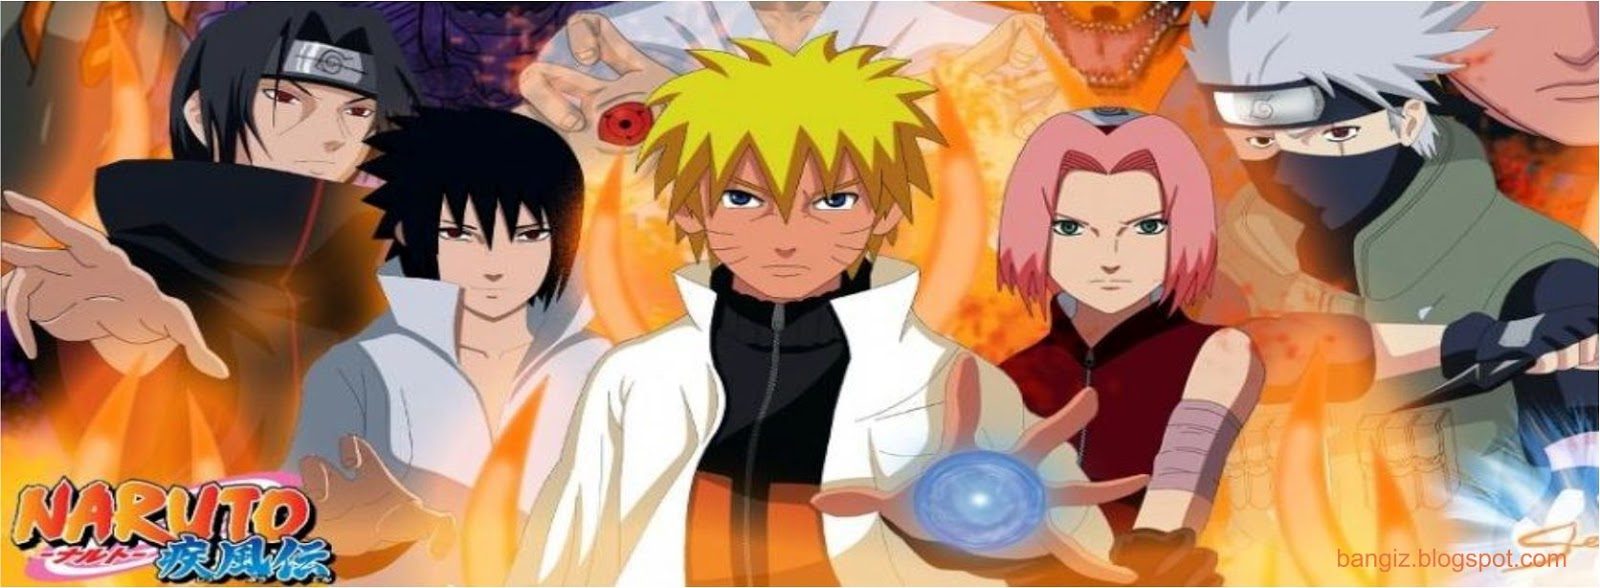 Naruto Mugen Через Торрент